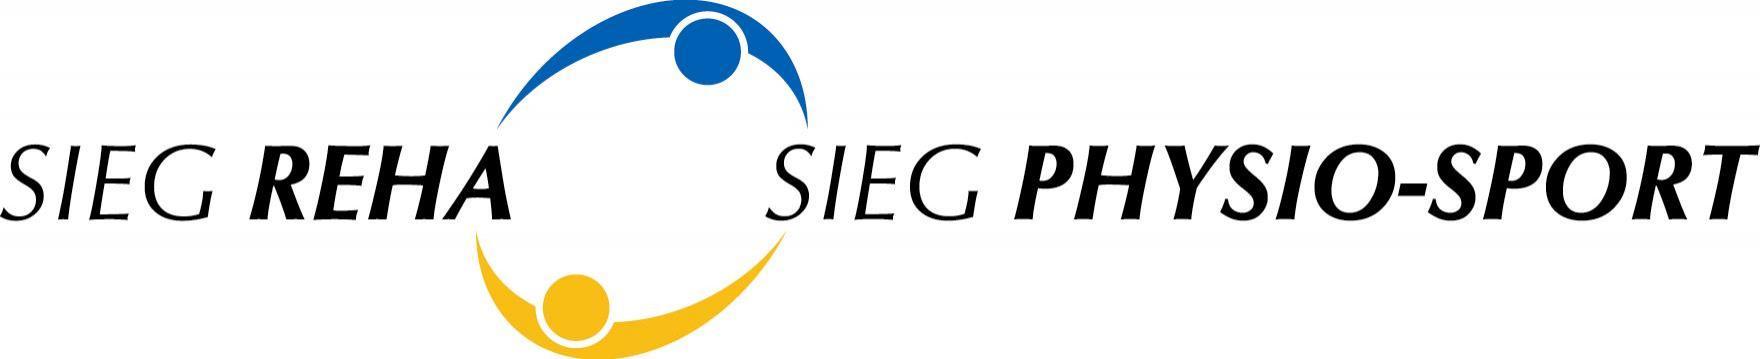 WP 1_logo_sieg_reha_sieg_physio_sport